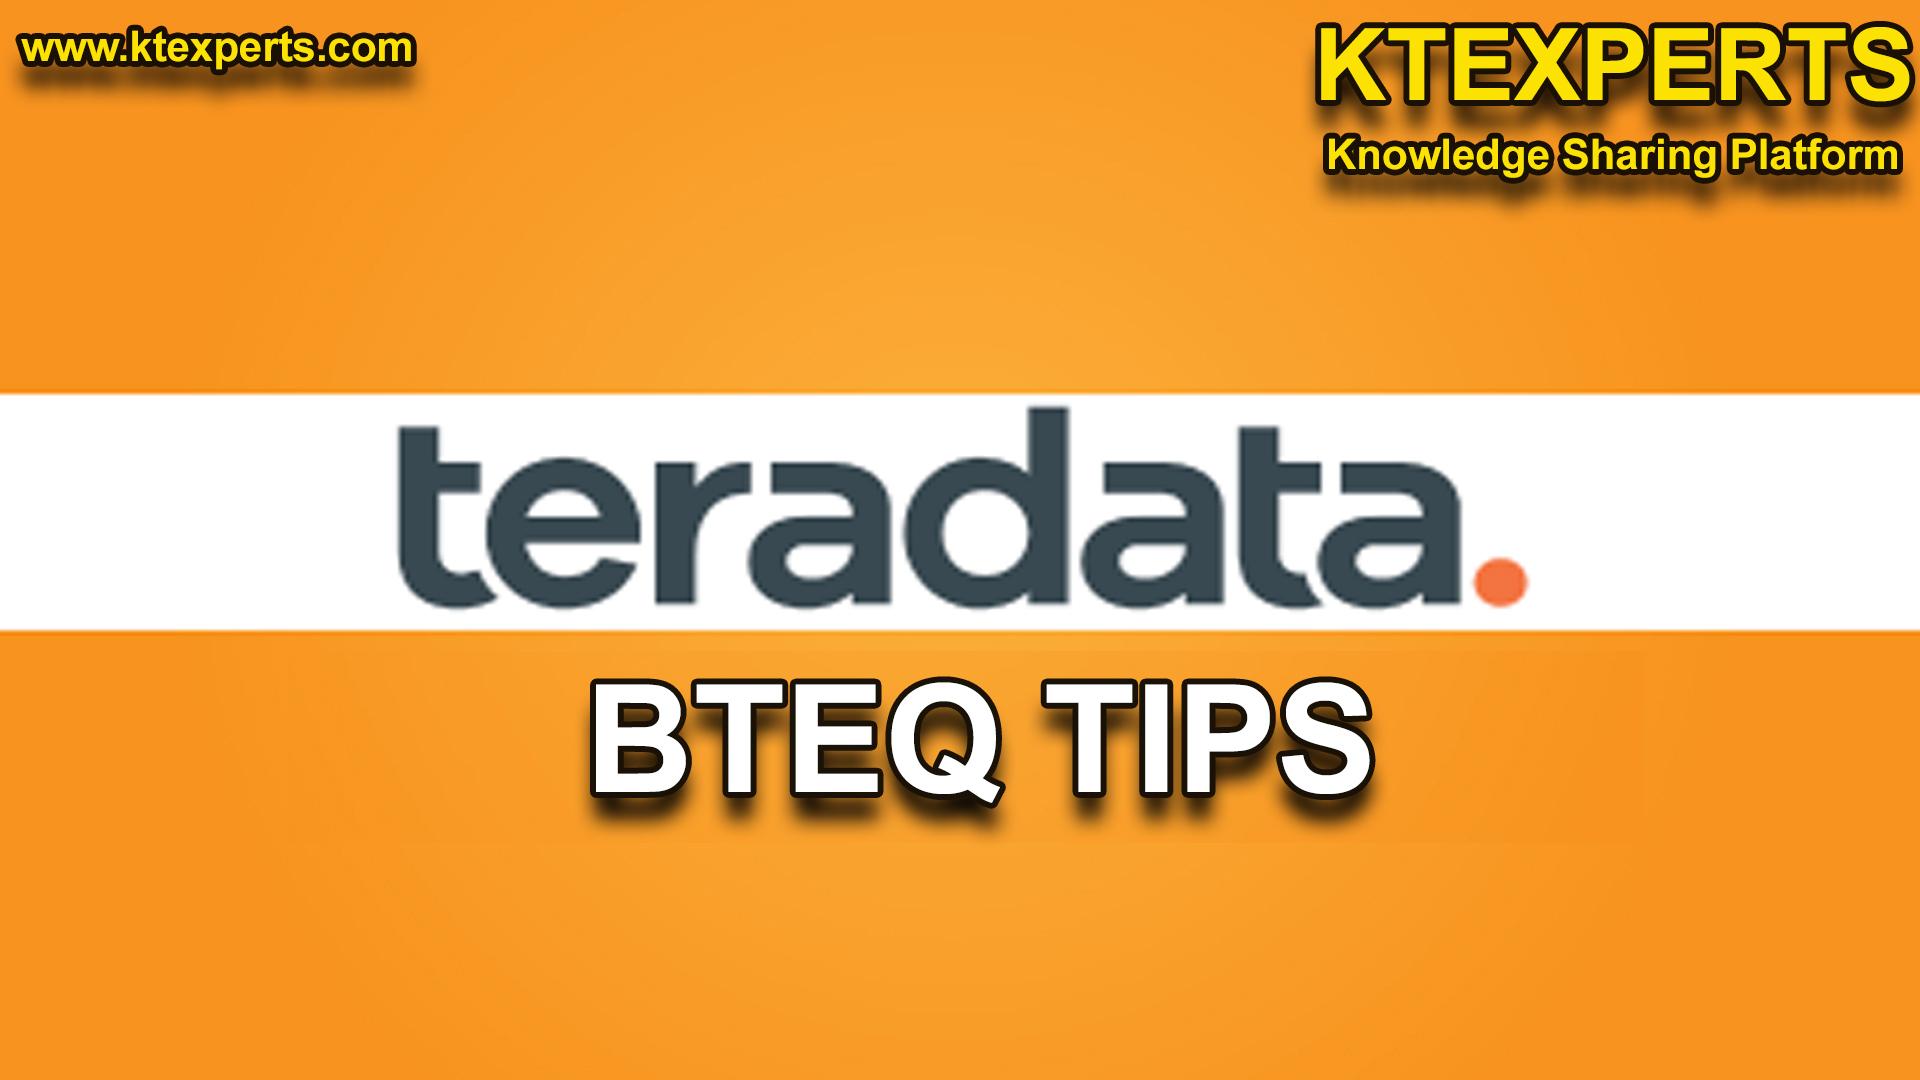 BTEQ TIPS in Teradata